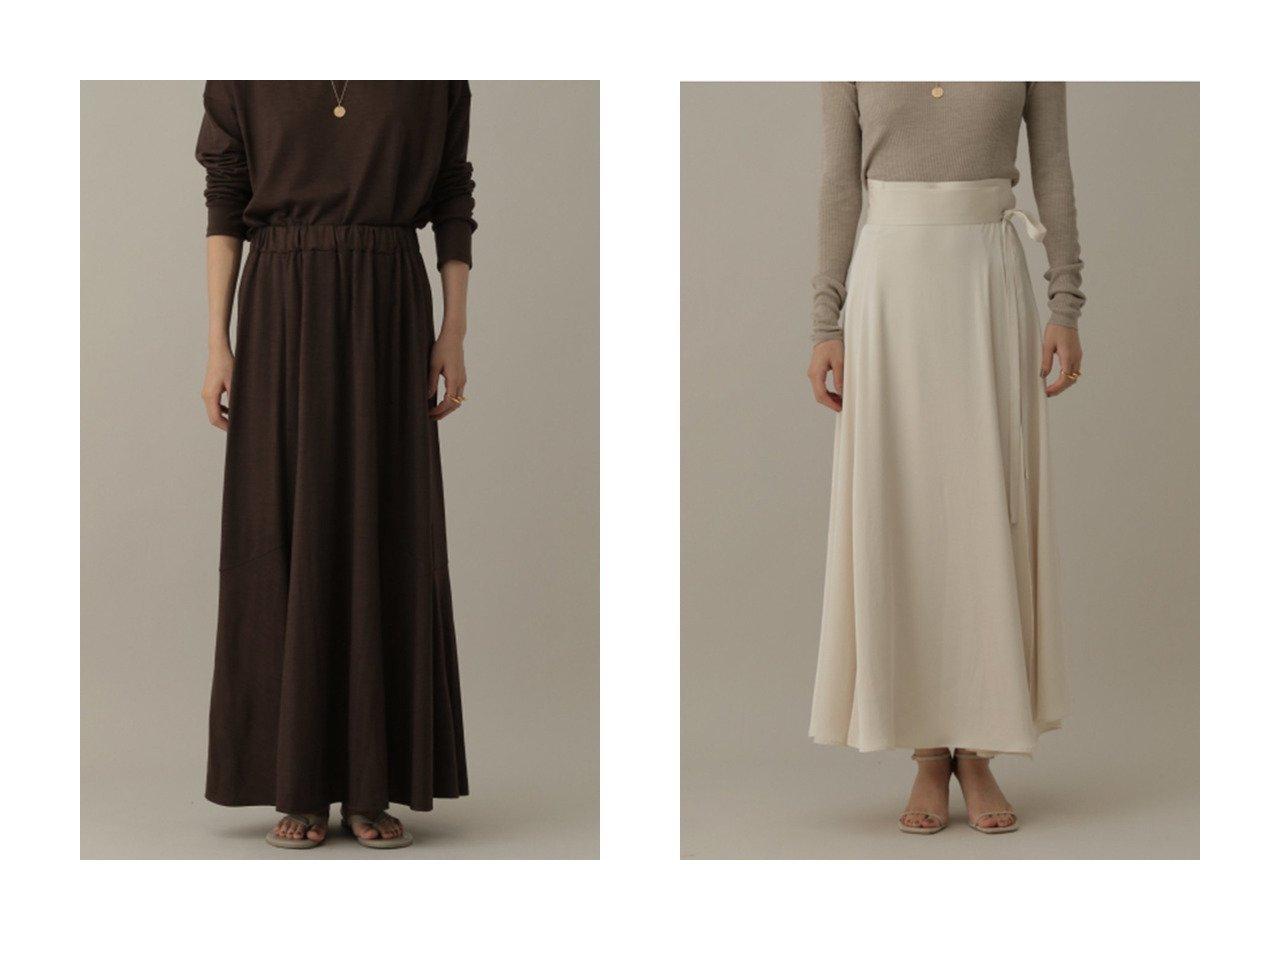 【Chaos/カオス】のプレインカットロングフレアースカート&ジェラサテンラップ ロングフレアースカート 【スカート】おすすめ!人気、トレンド・レディースファッションの通販 おすすめで人気の流行・トレンド、ファッションの通販商品 インテリア・家具・メンズファッション・キッズファッション・レディースファッション・服の通販 founy(ファニー) https://founy.com/ ファッション Fashion レディースファッション WOMEN スカート Skirt ロングスカート Long Skirt 2020年 2020 2020-2021秋冬・A/W AW・Autumn/Winter・FW・Fall-Winter/2020-2021 2021年 2021 2021-2022秋冬・A/W AW・Autumn/Winter・FW・Fall-Winter・2021-2022 A/W・秋冬 AW・Autumn/Winter・FW・Fall-Winter おすすめ Recommend カットソー セットアップ マキシ ロング サテン シルク バランス ラップ 人気 再入荷 Restock/Back in Stock/Re Arrival |ID:crp329100000056315